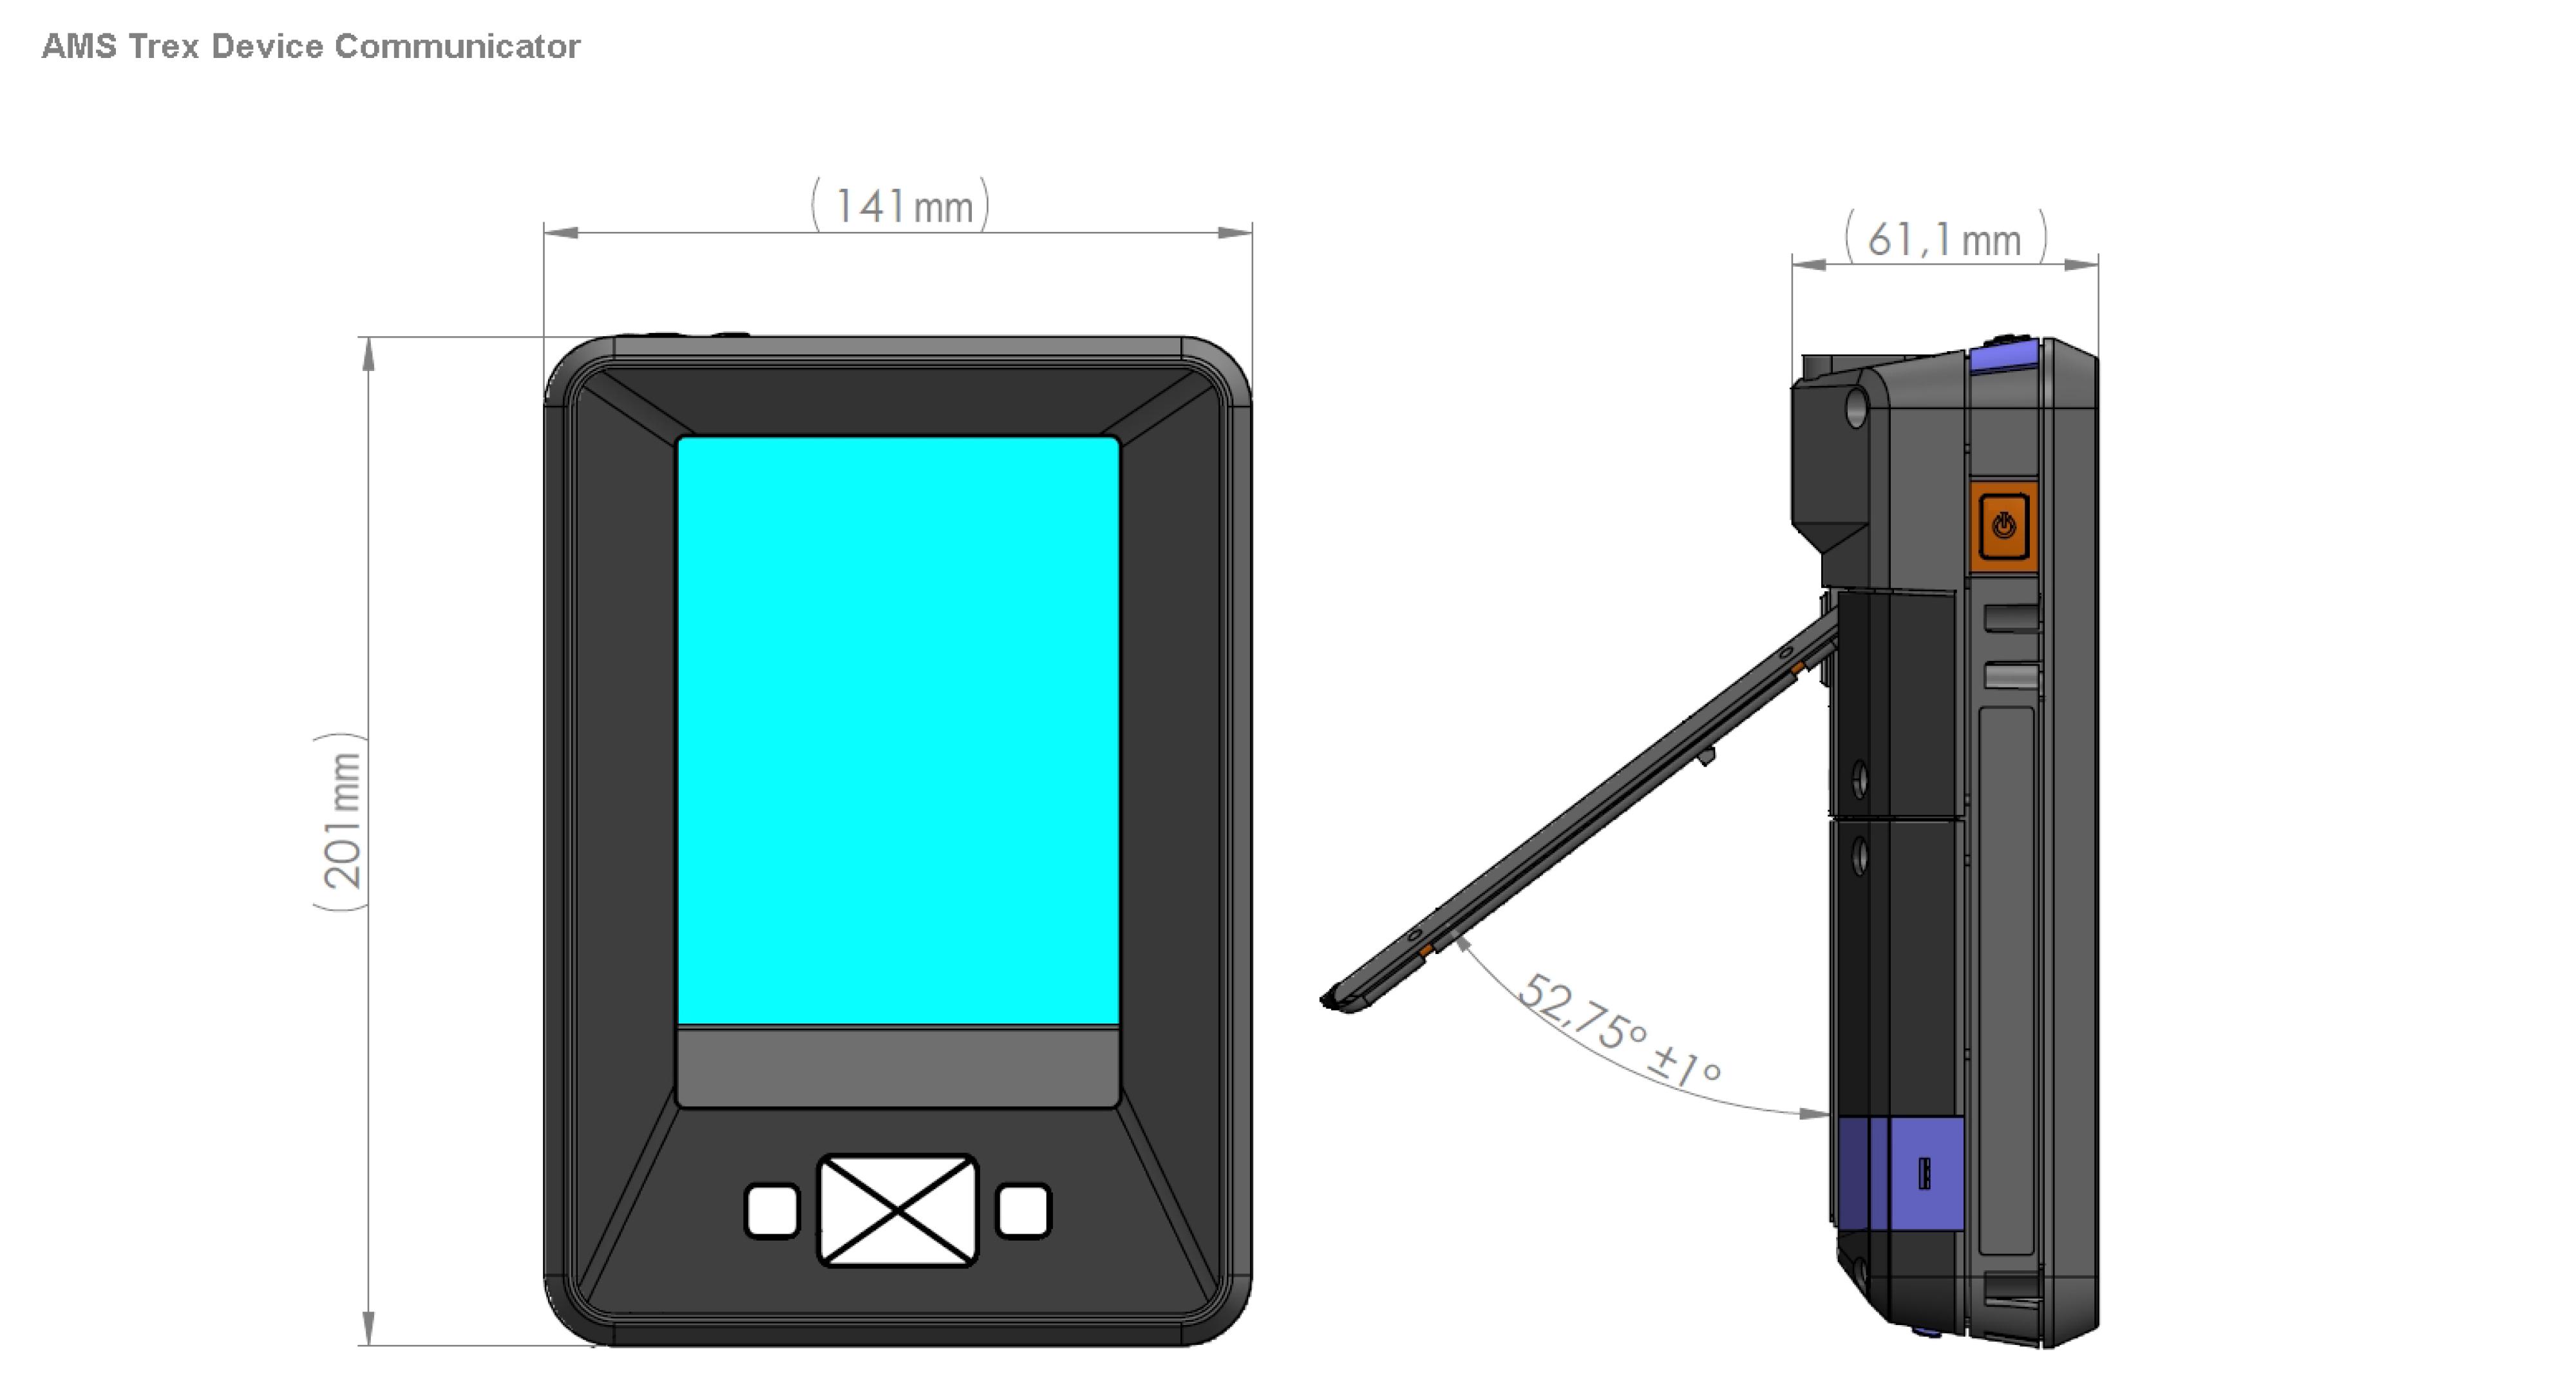 TREXCFPKLWP3 | Emerson | AMS Trex Device Communicator